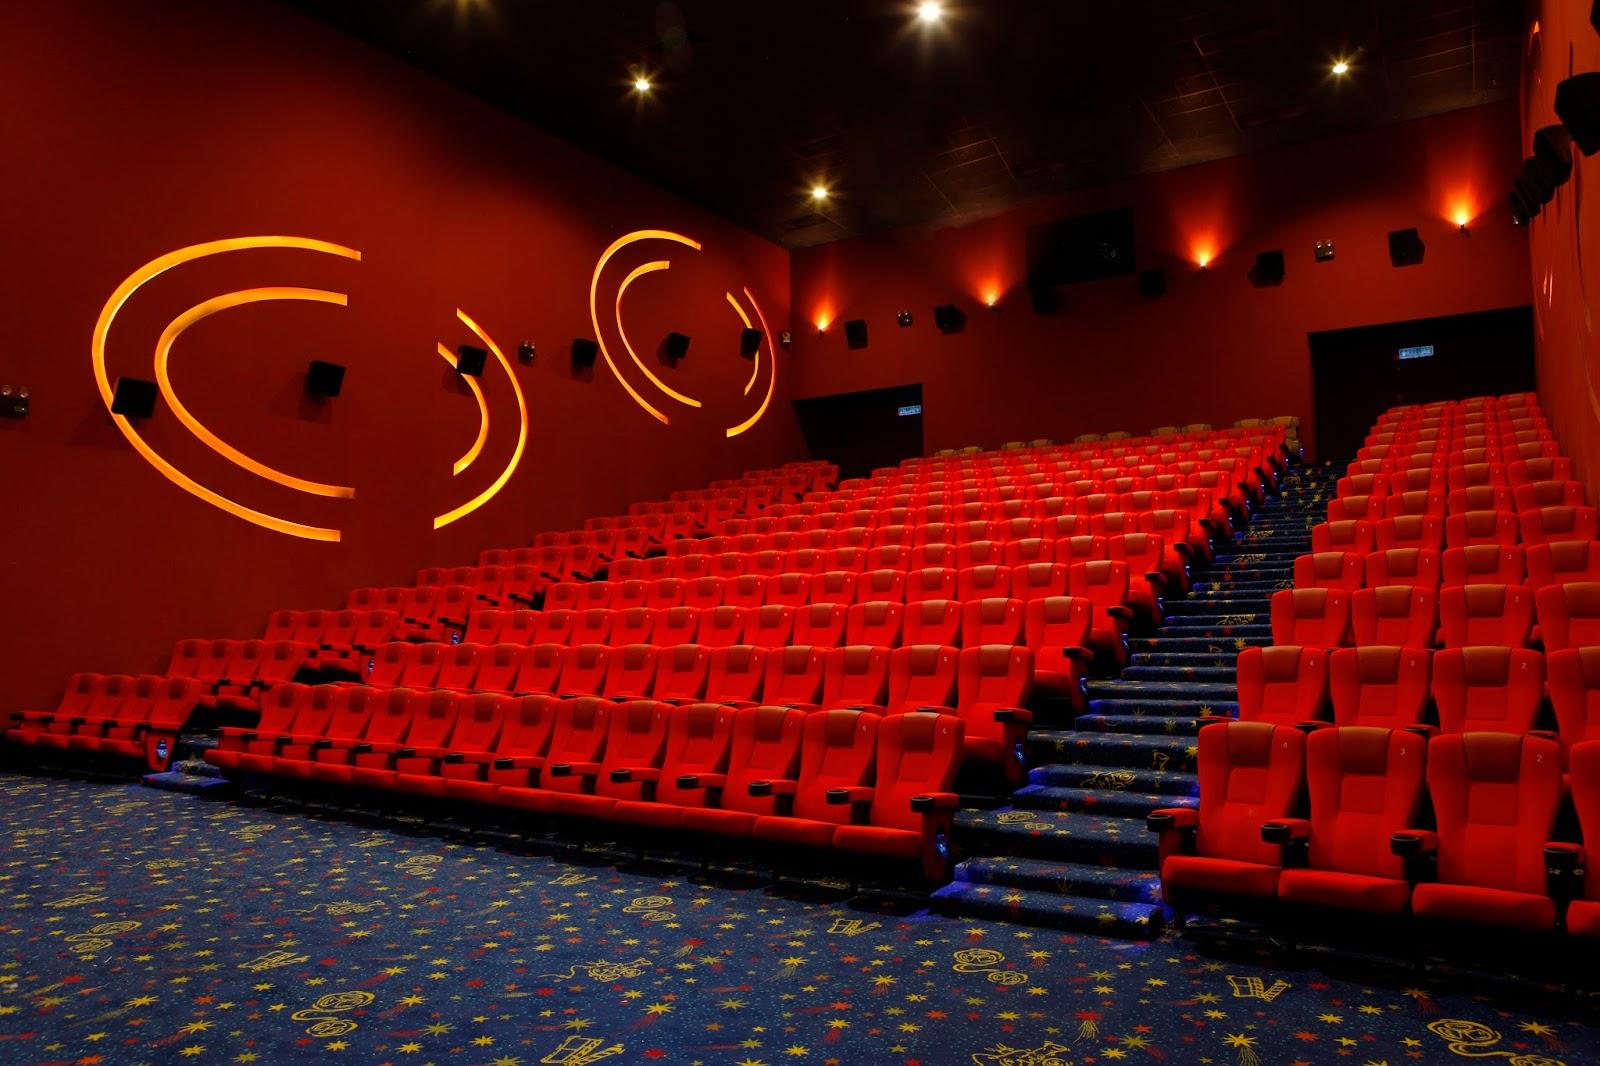 Golden Screen Cinemas Gsc Launch Klang Parade Small